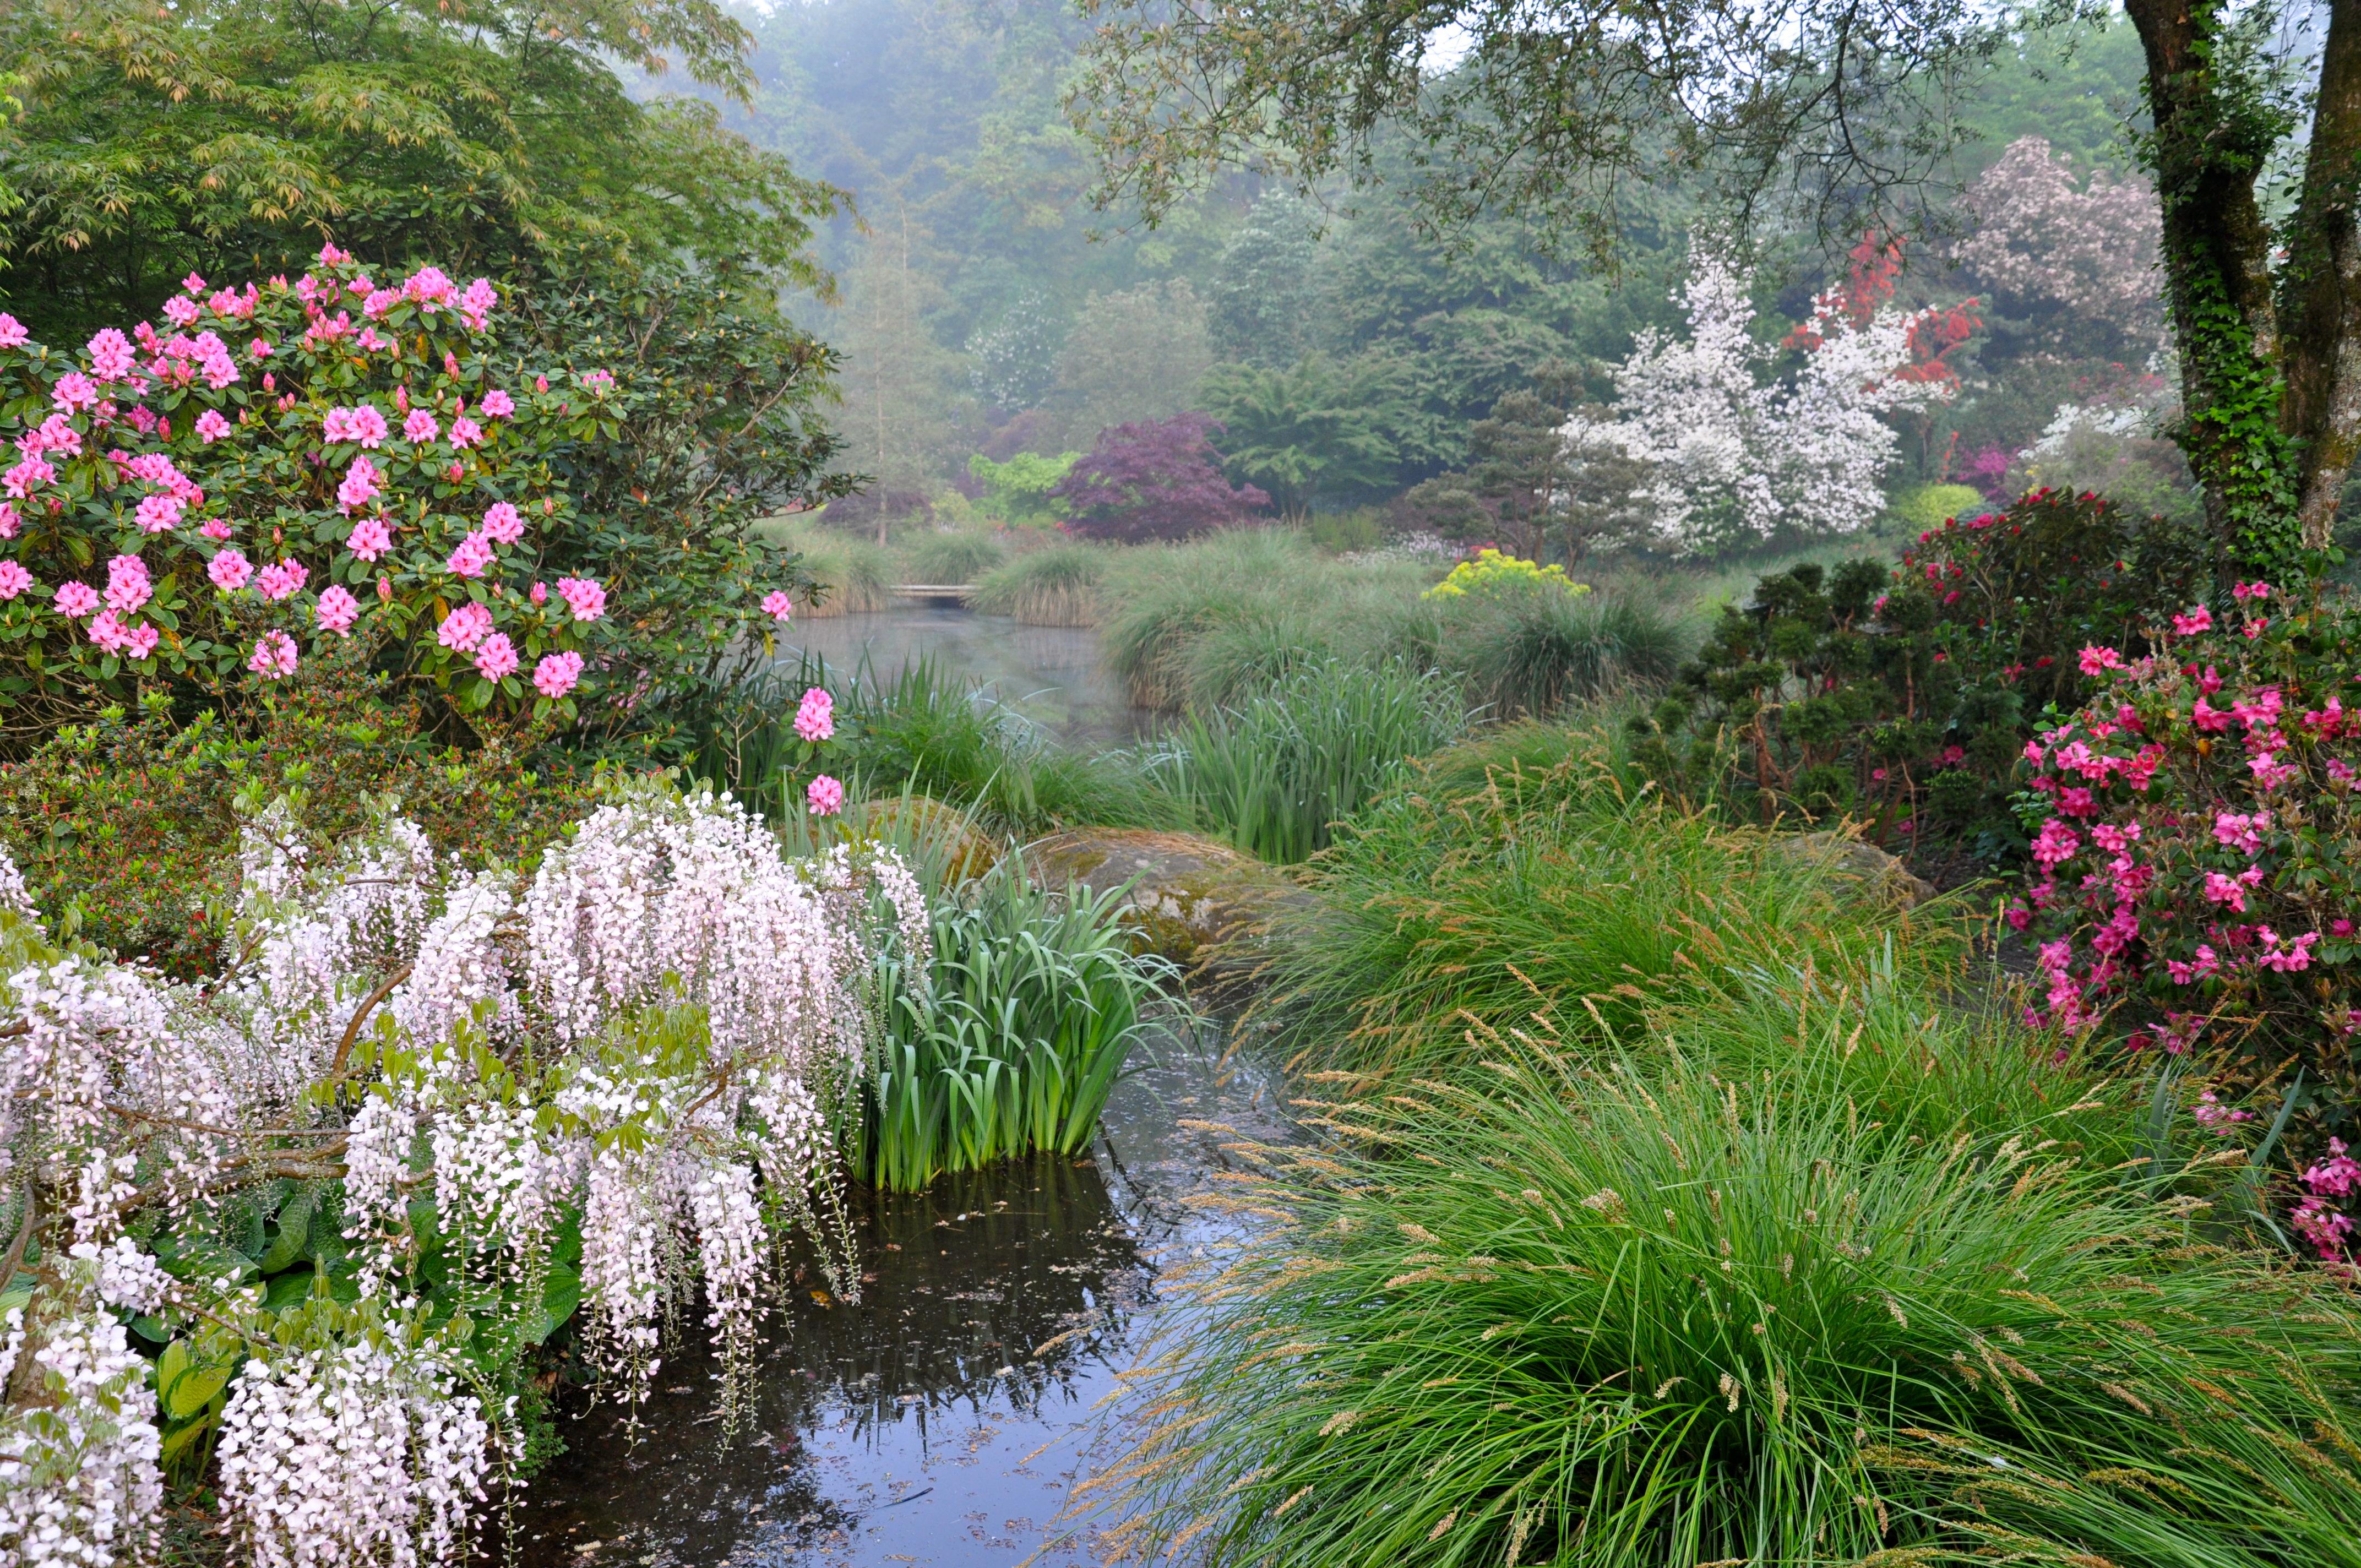 Liste des jardins portant le label jardin remarquable for Le jardin